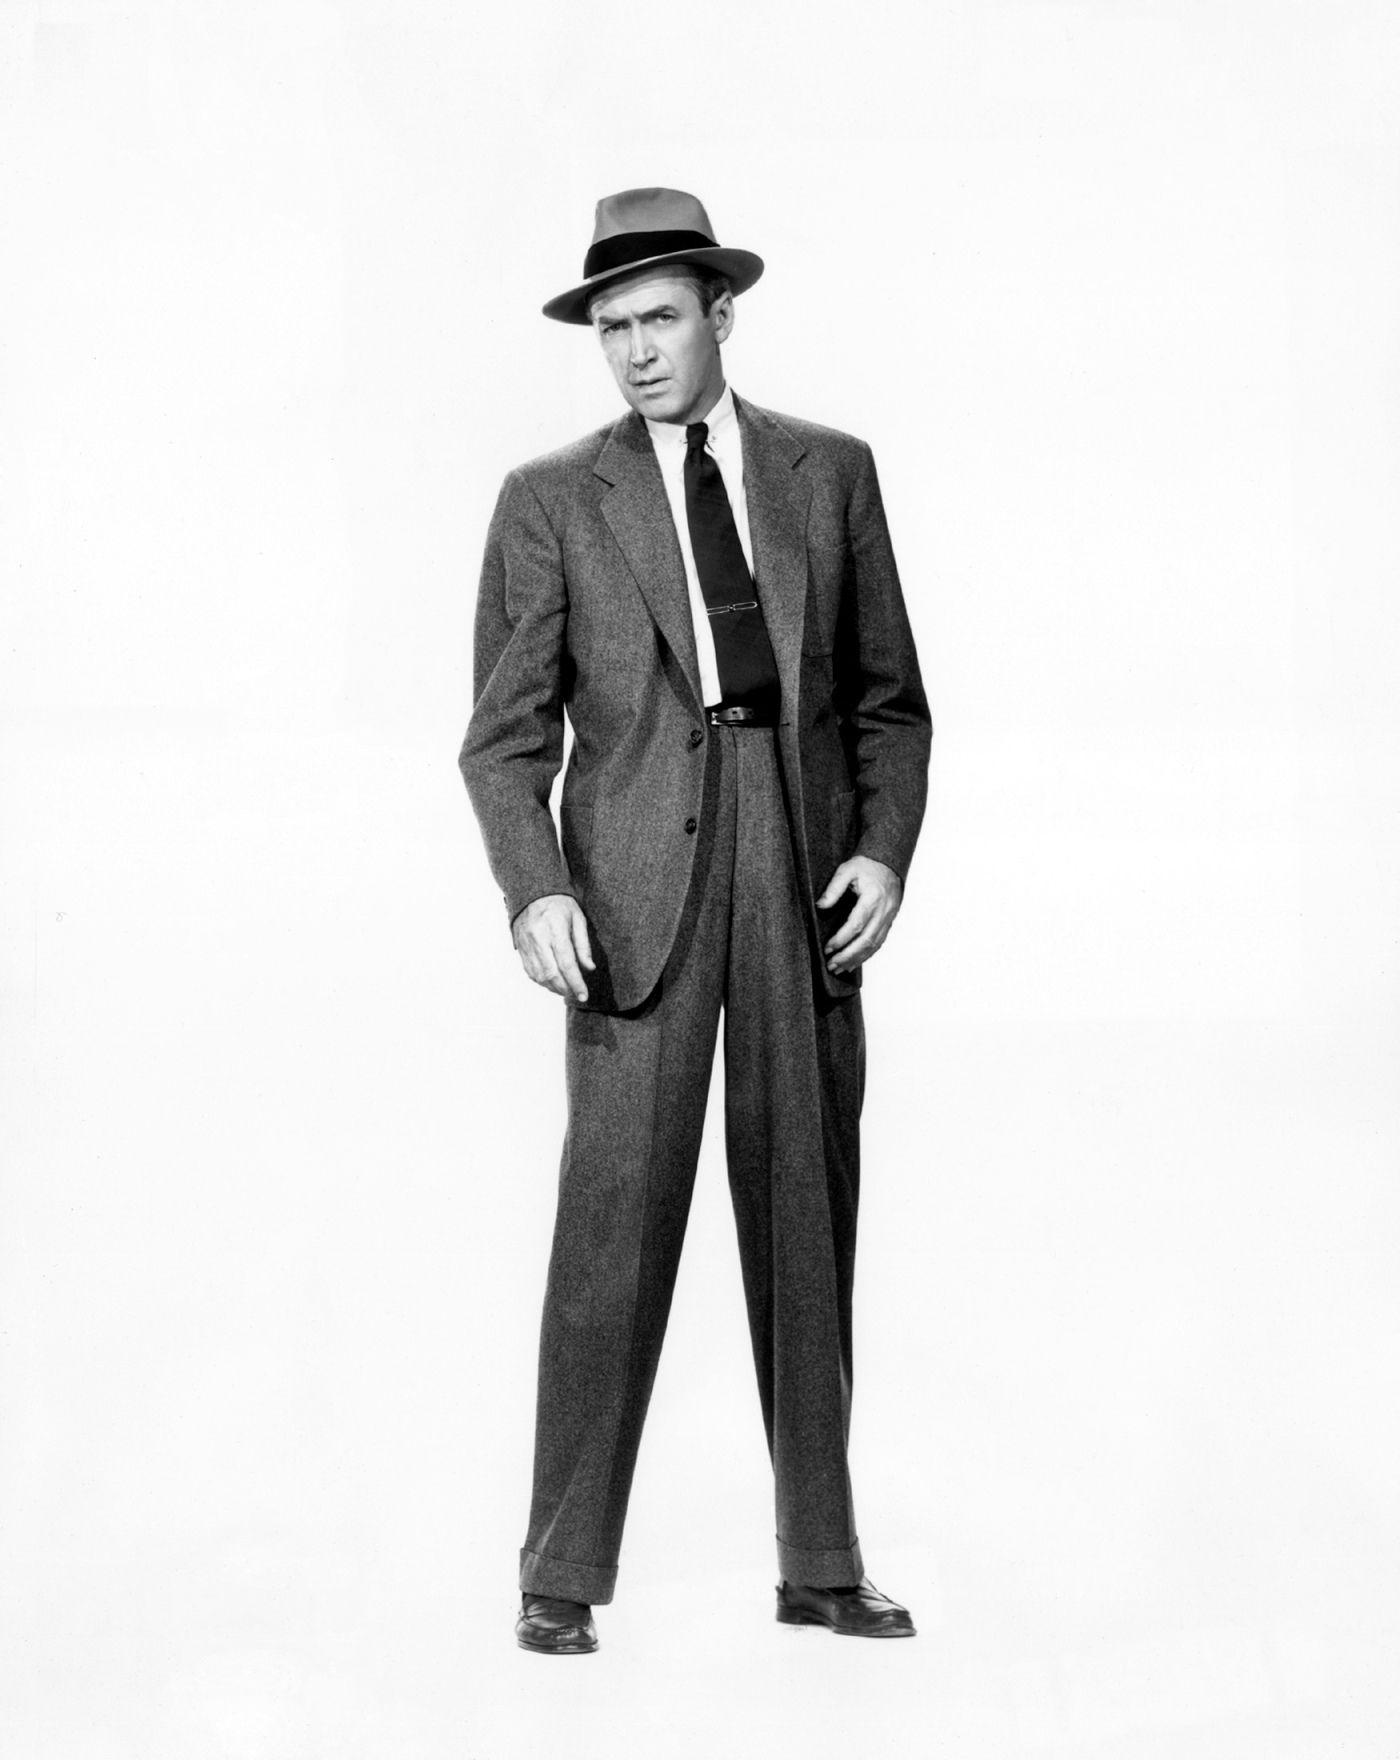 James Stewart | Actor james, American actors and Vertigo